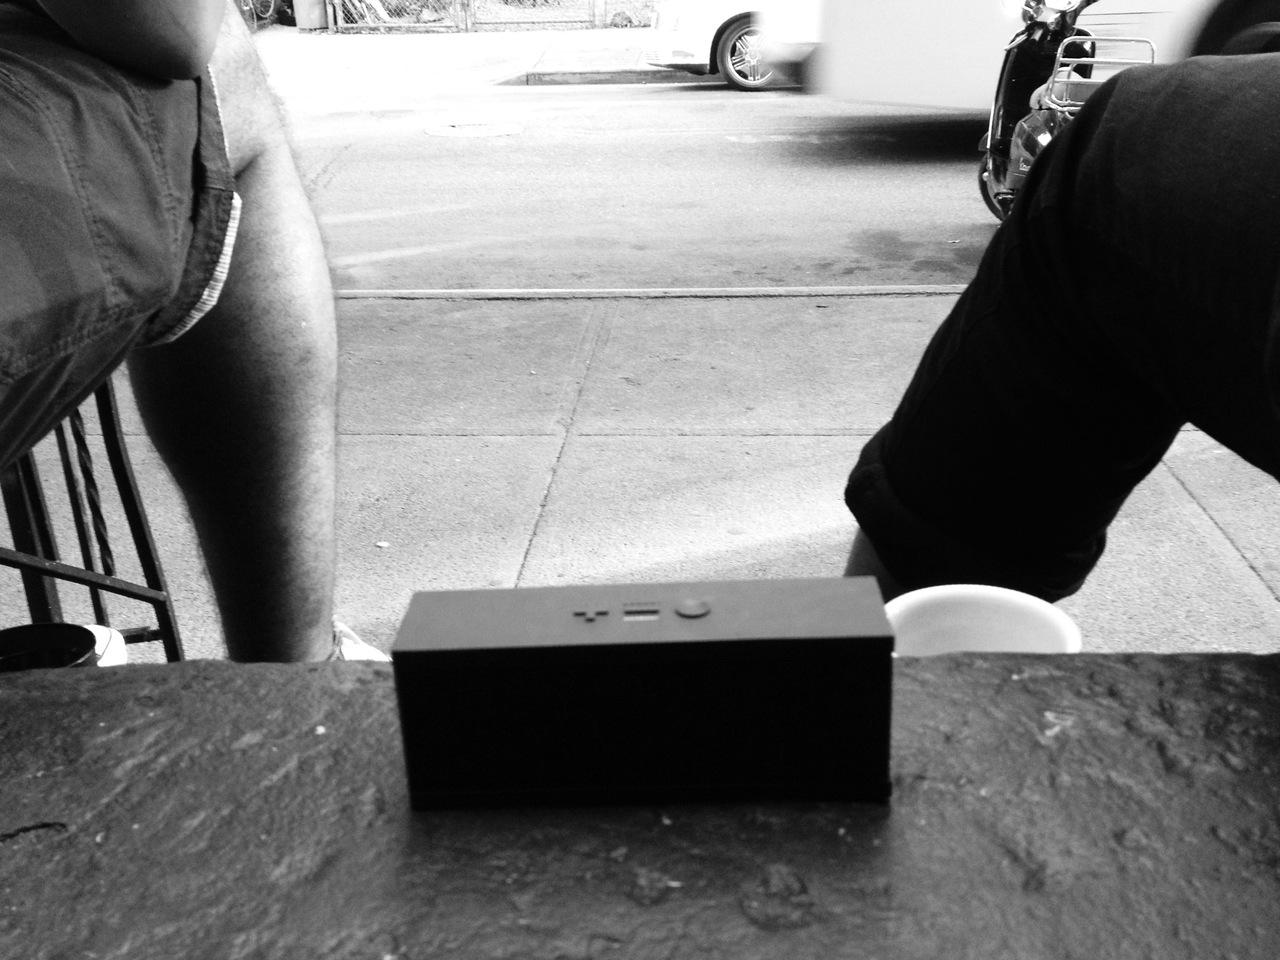 #jambox on the stoop